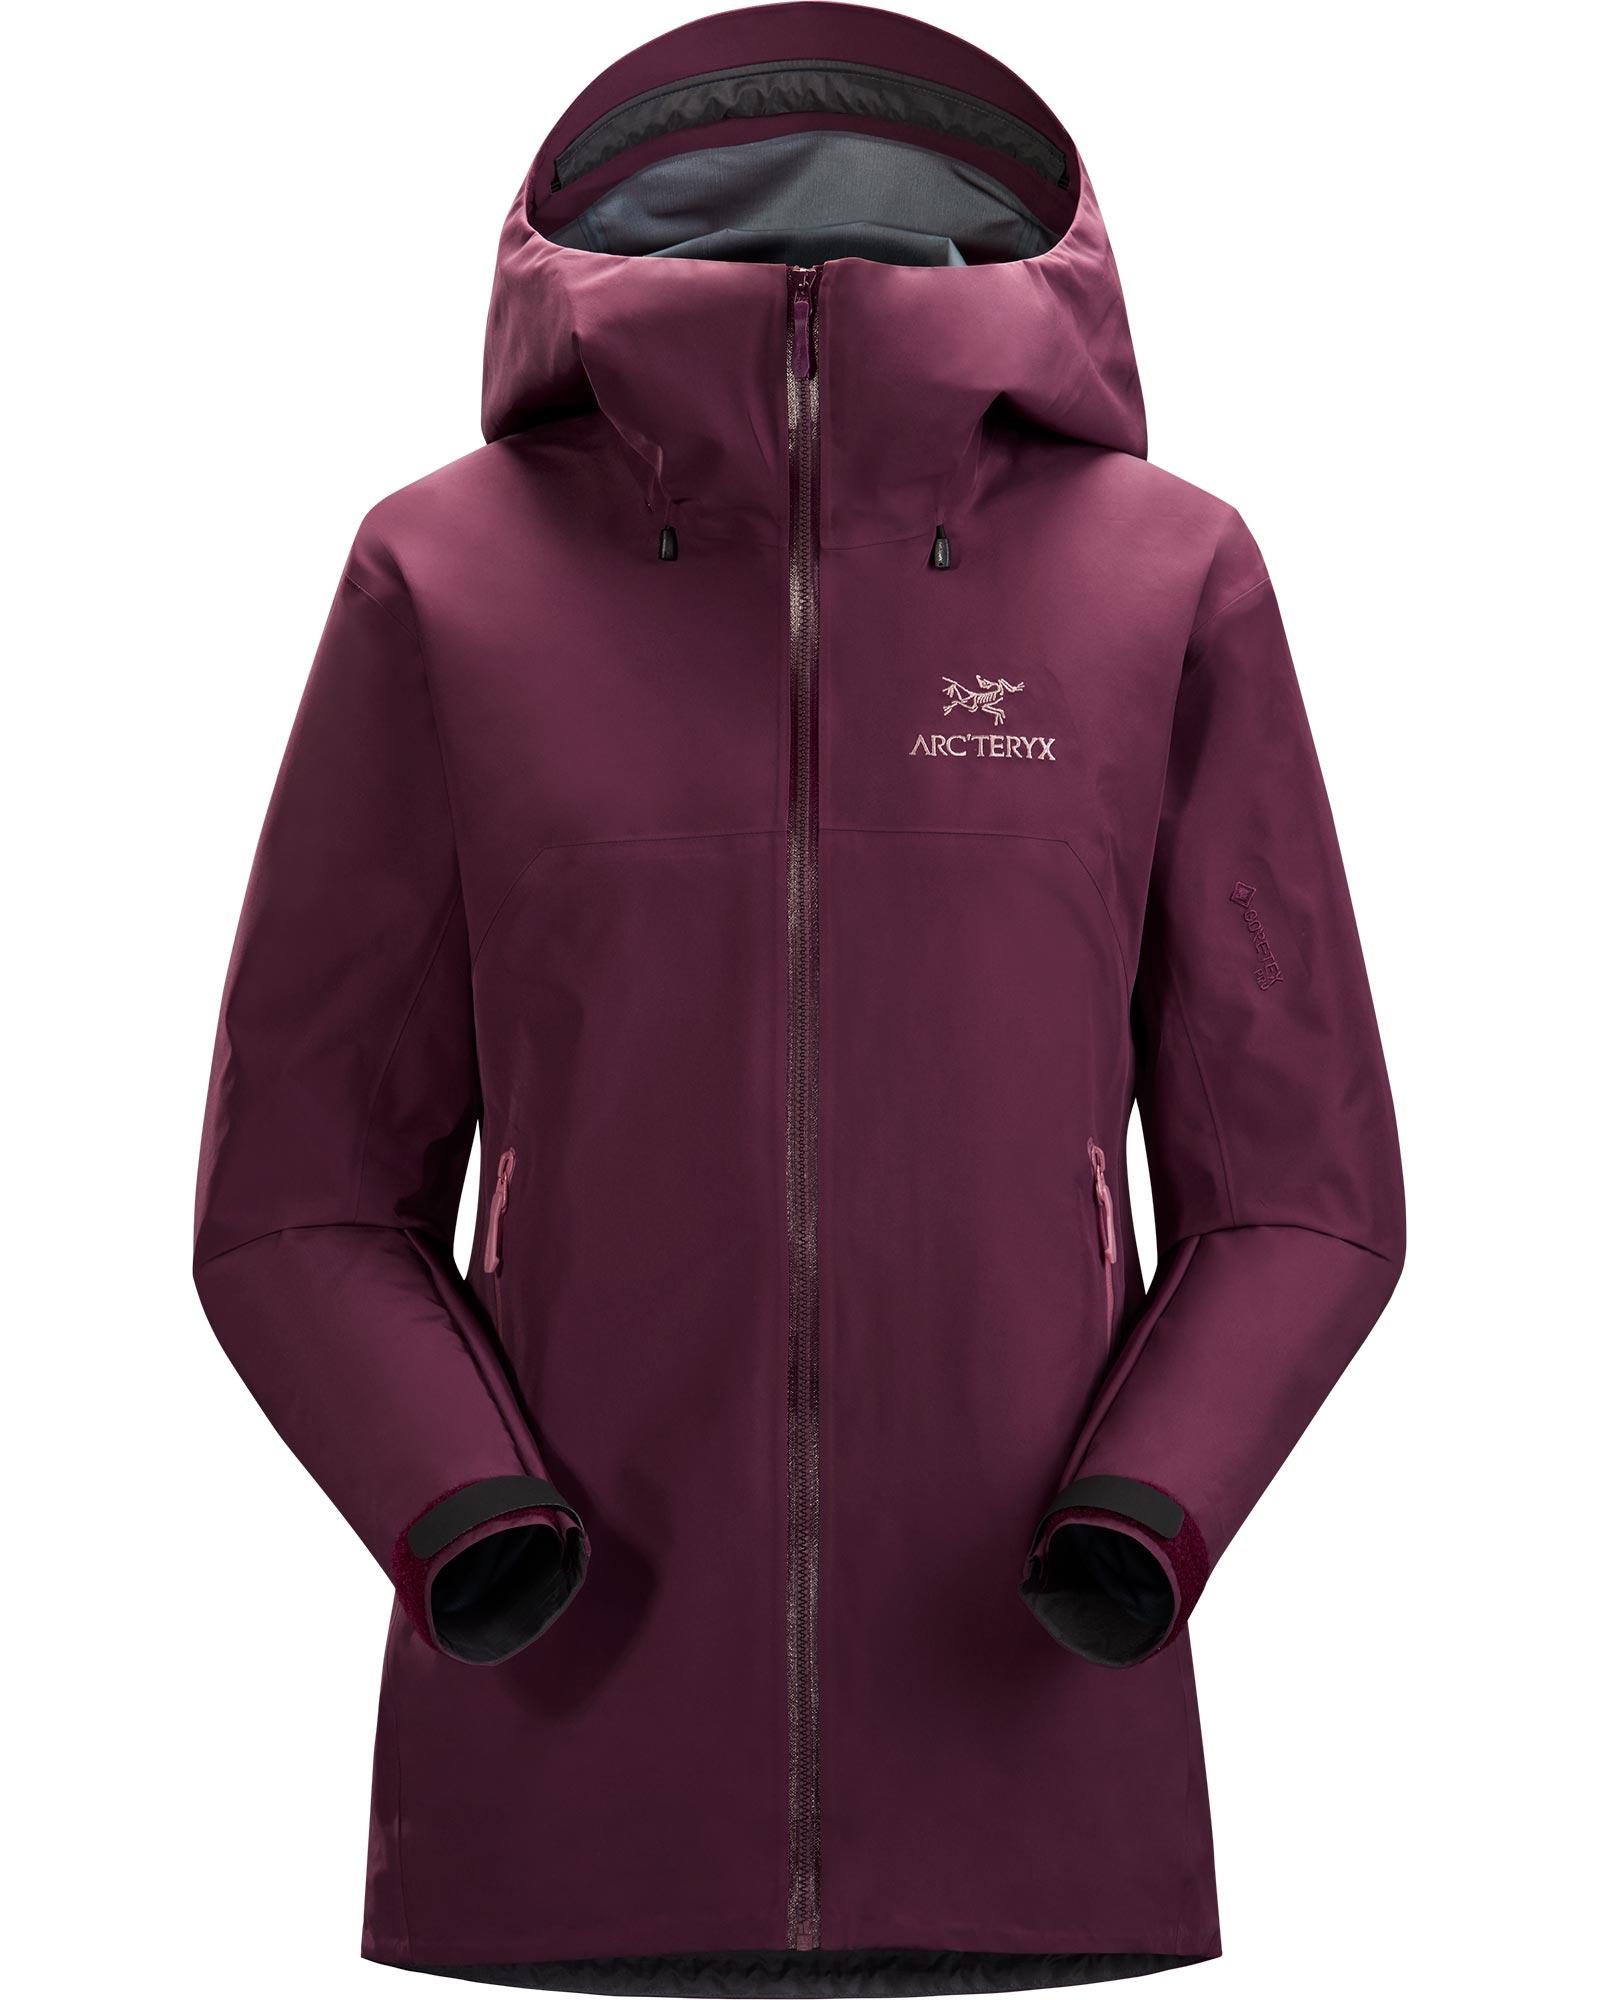 Arc'teryx Women's Beta FL GORE-TEX Pro Jacket 0